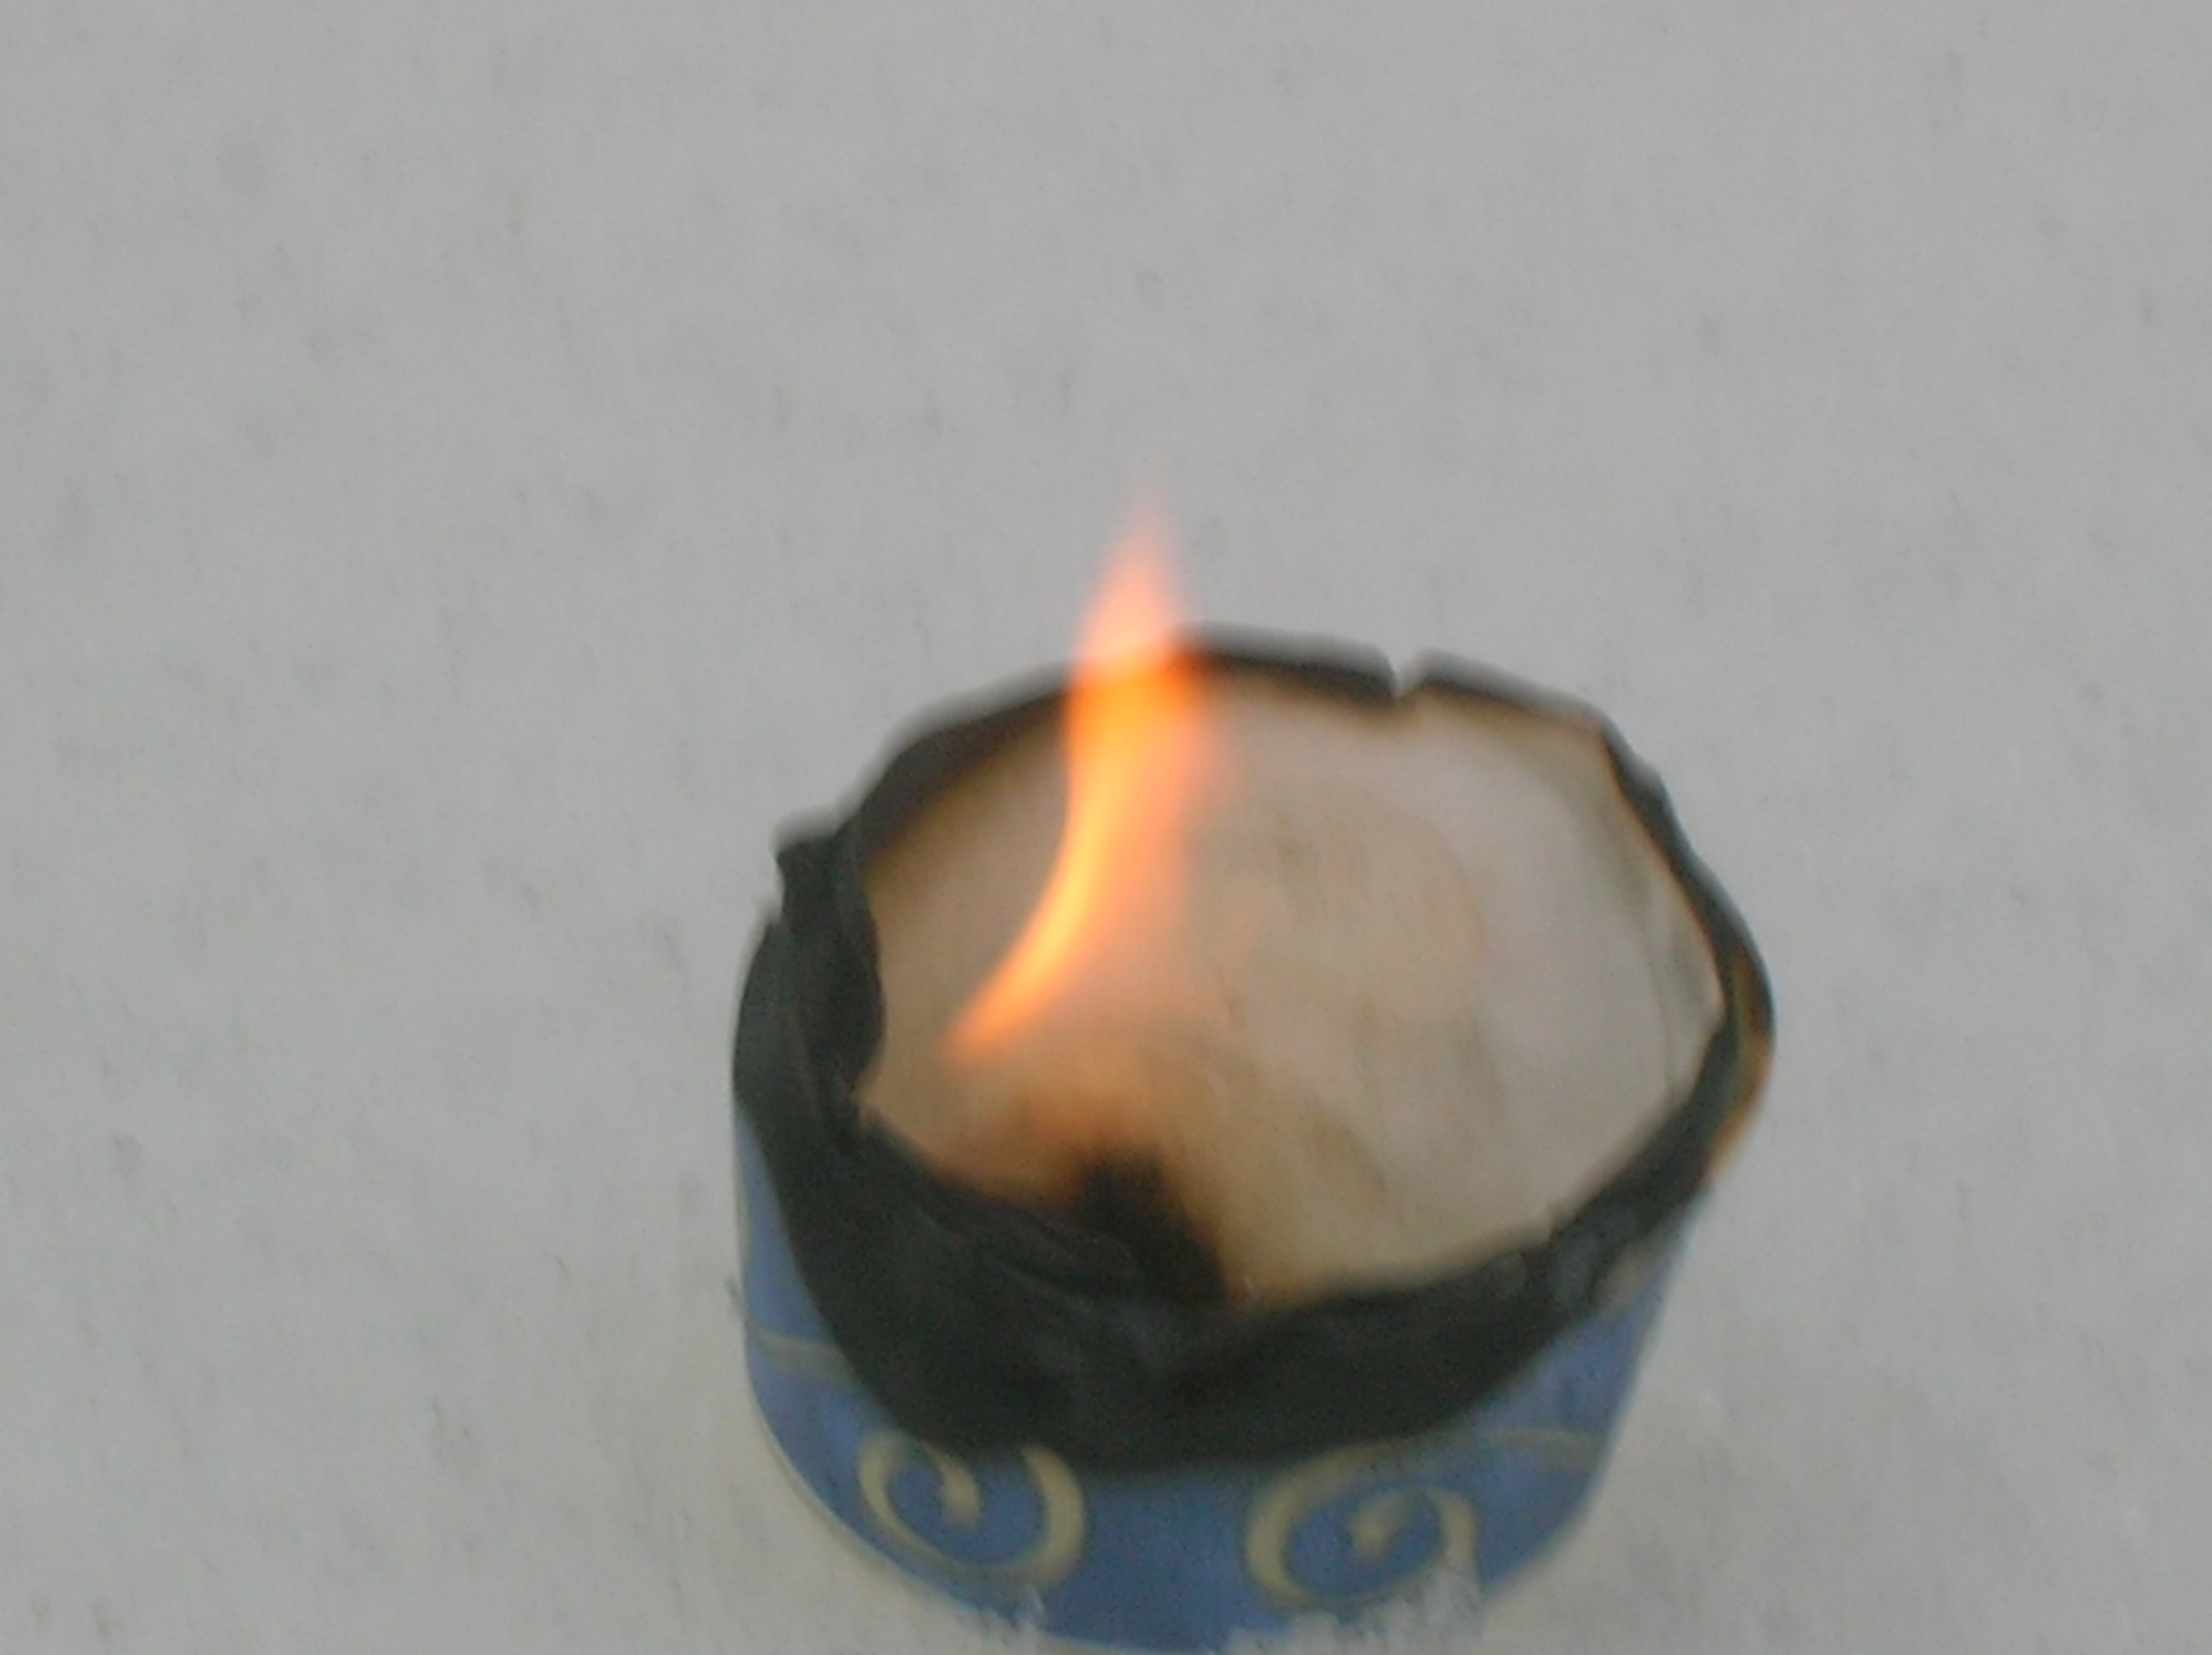 Worlds Best Pocket-Sized Fire Starter